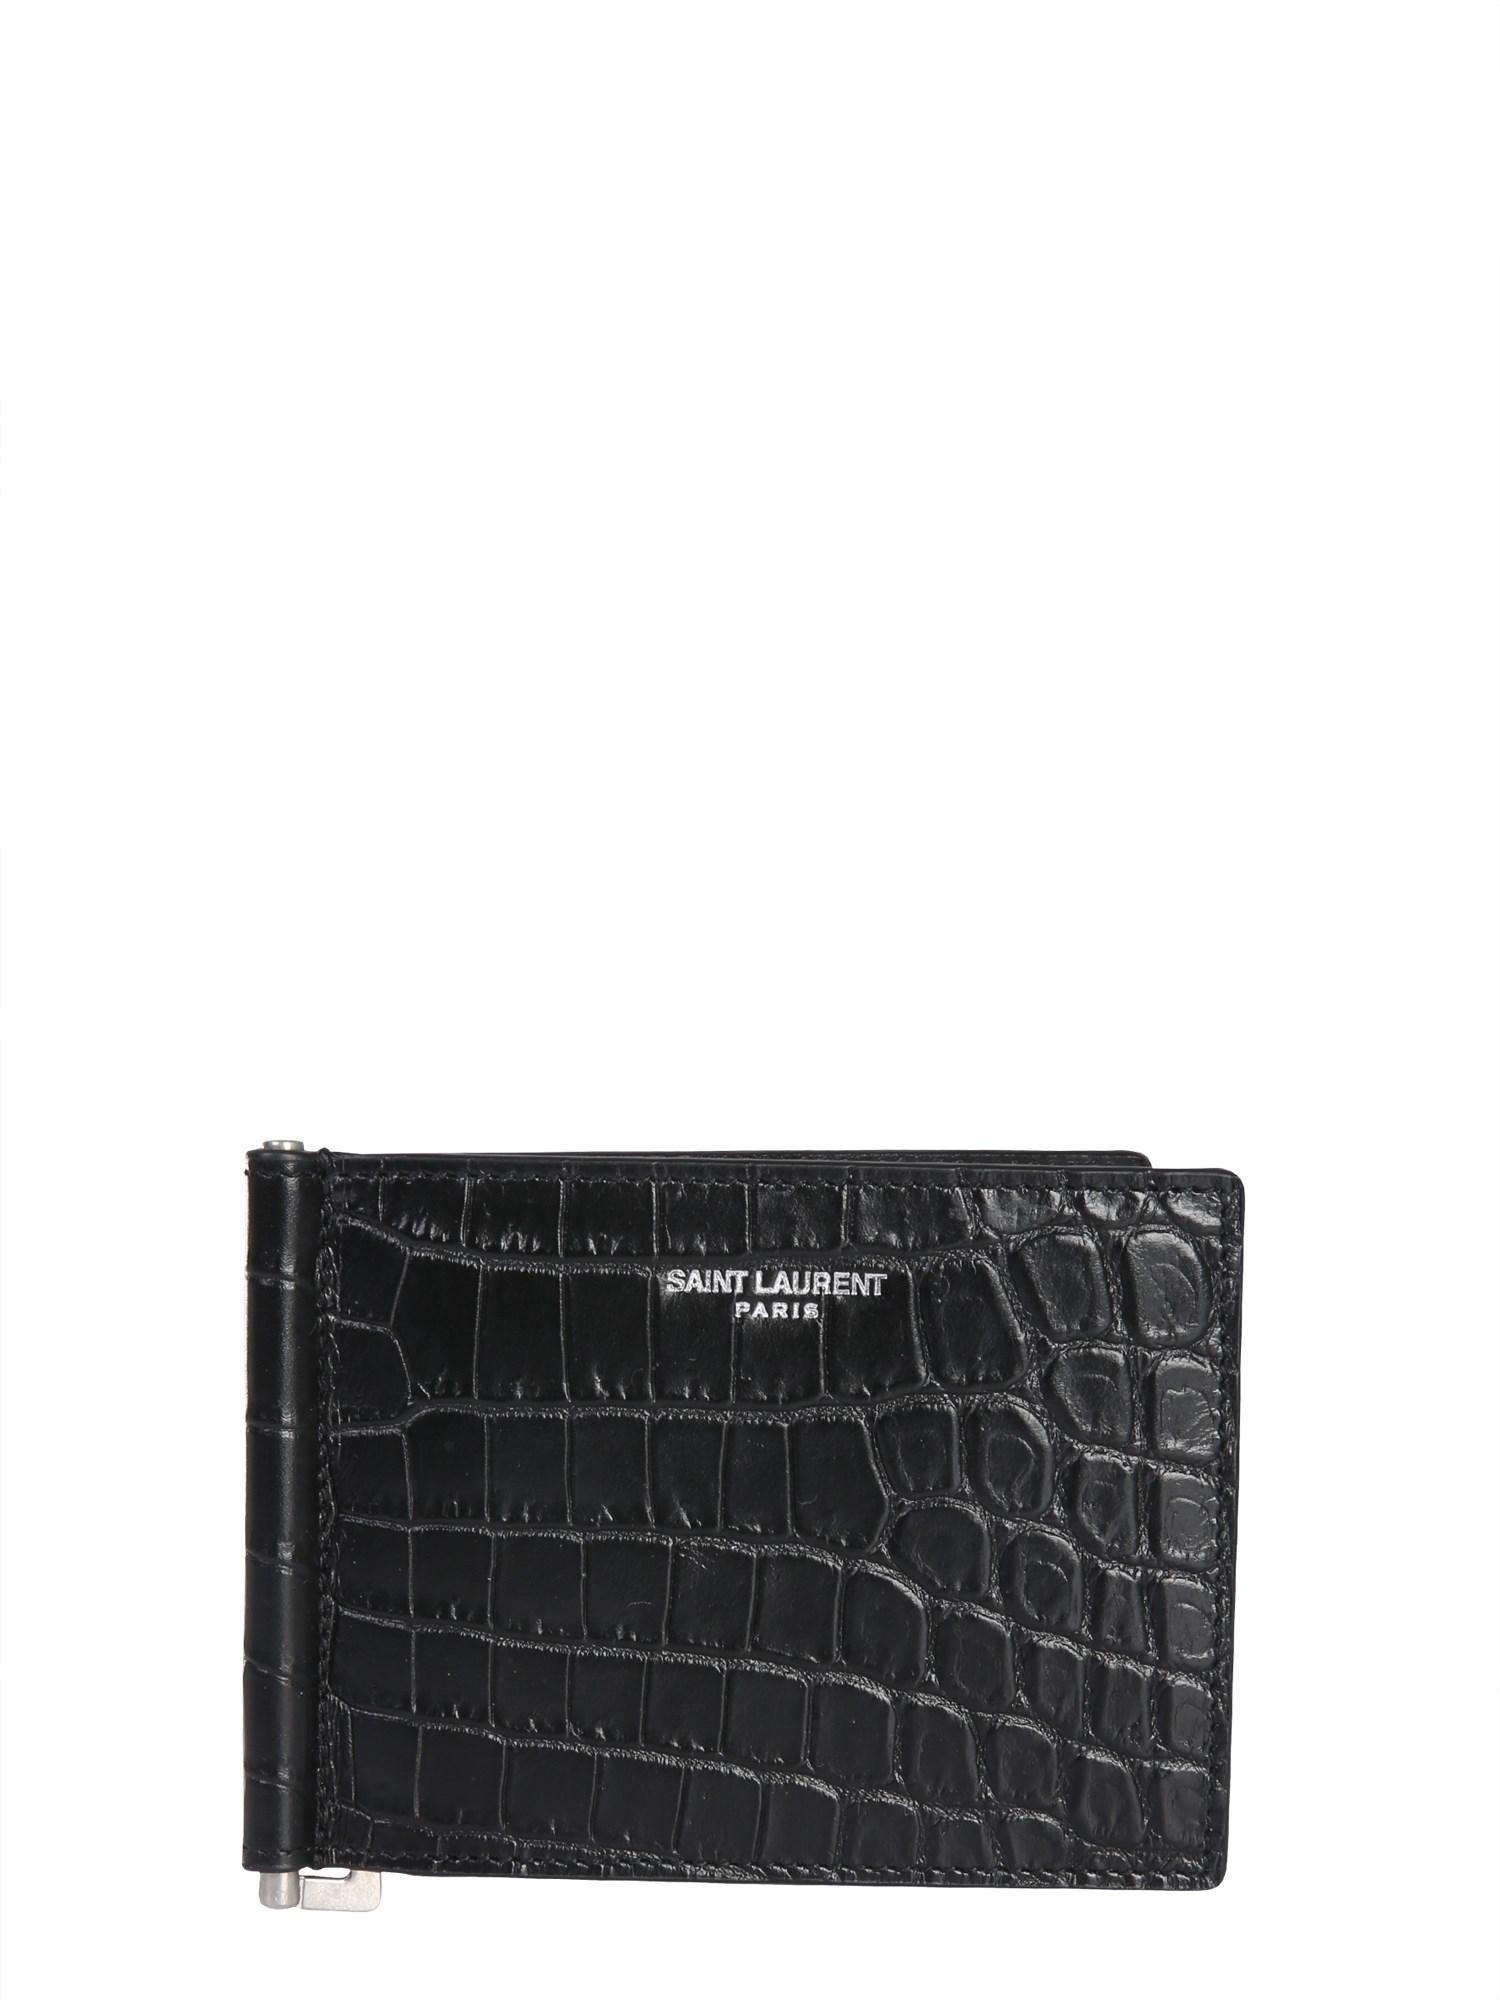 0a6914edcf9 Lyst - Saint Laurent Crocodile Printed Leather Card Holder in Black ...